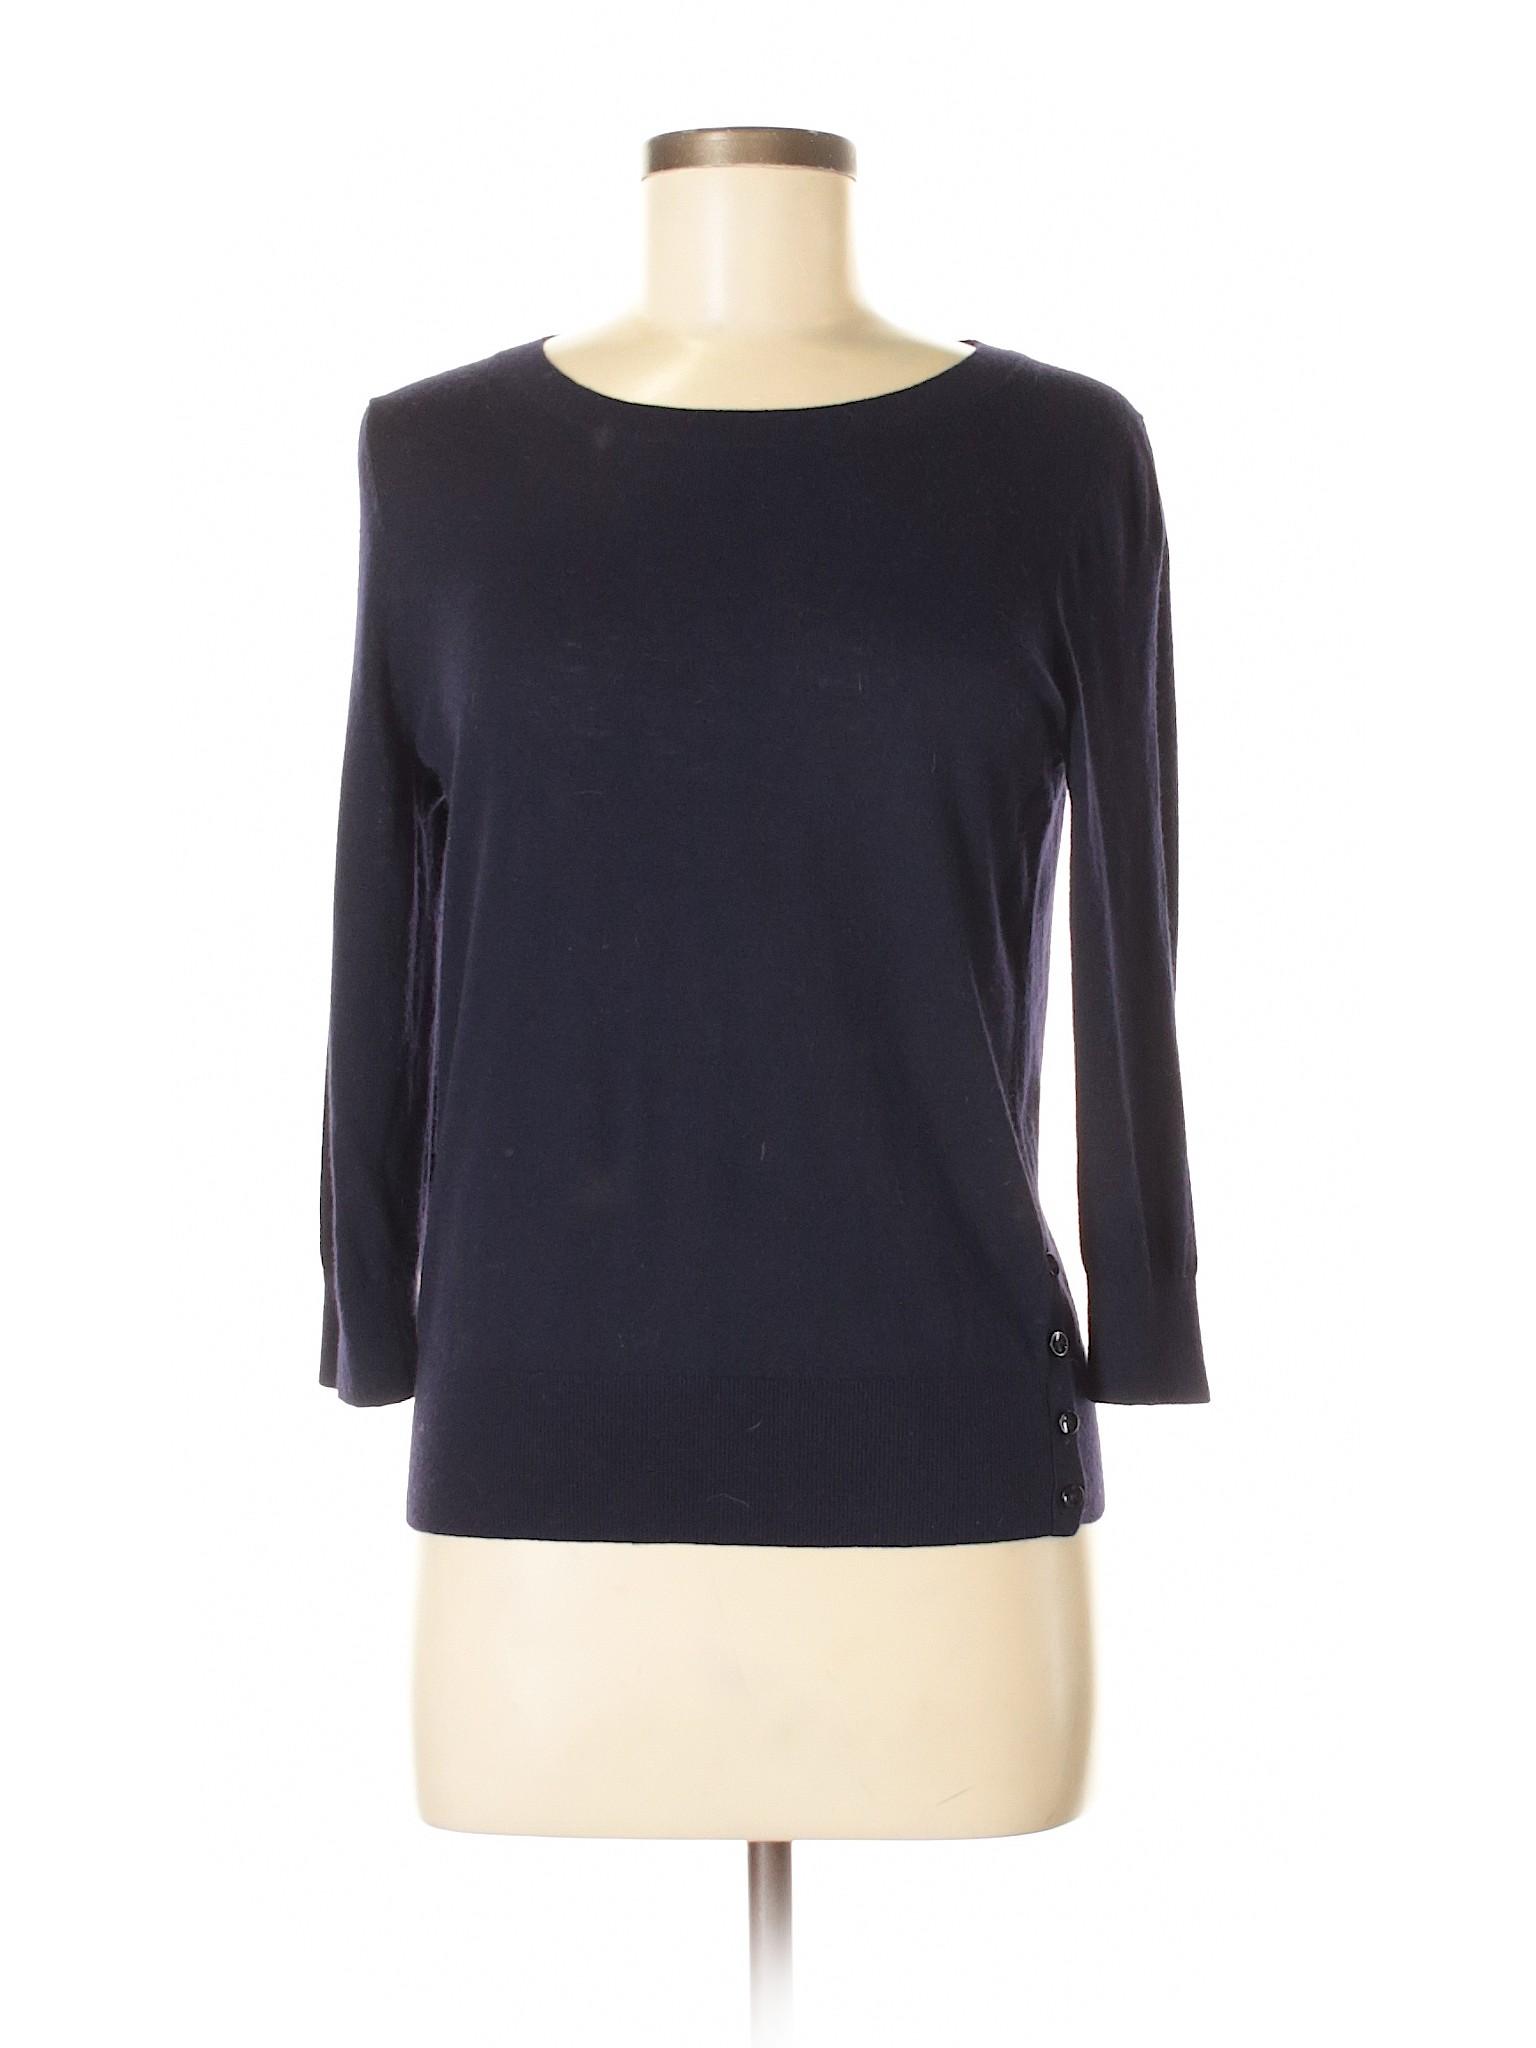 Ann Boutique Sweater Pullover Boutique Taylor Ann Taylor t0wq60O